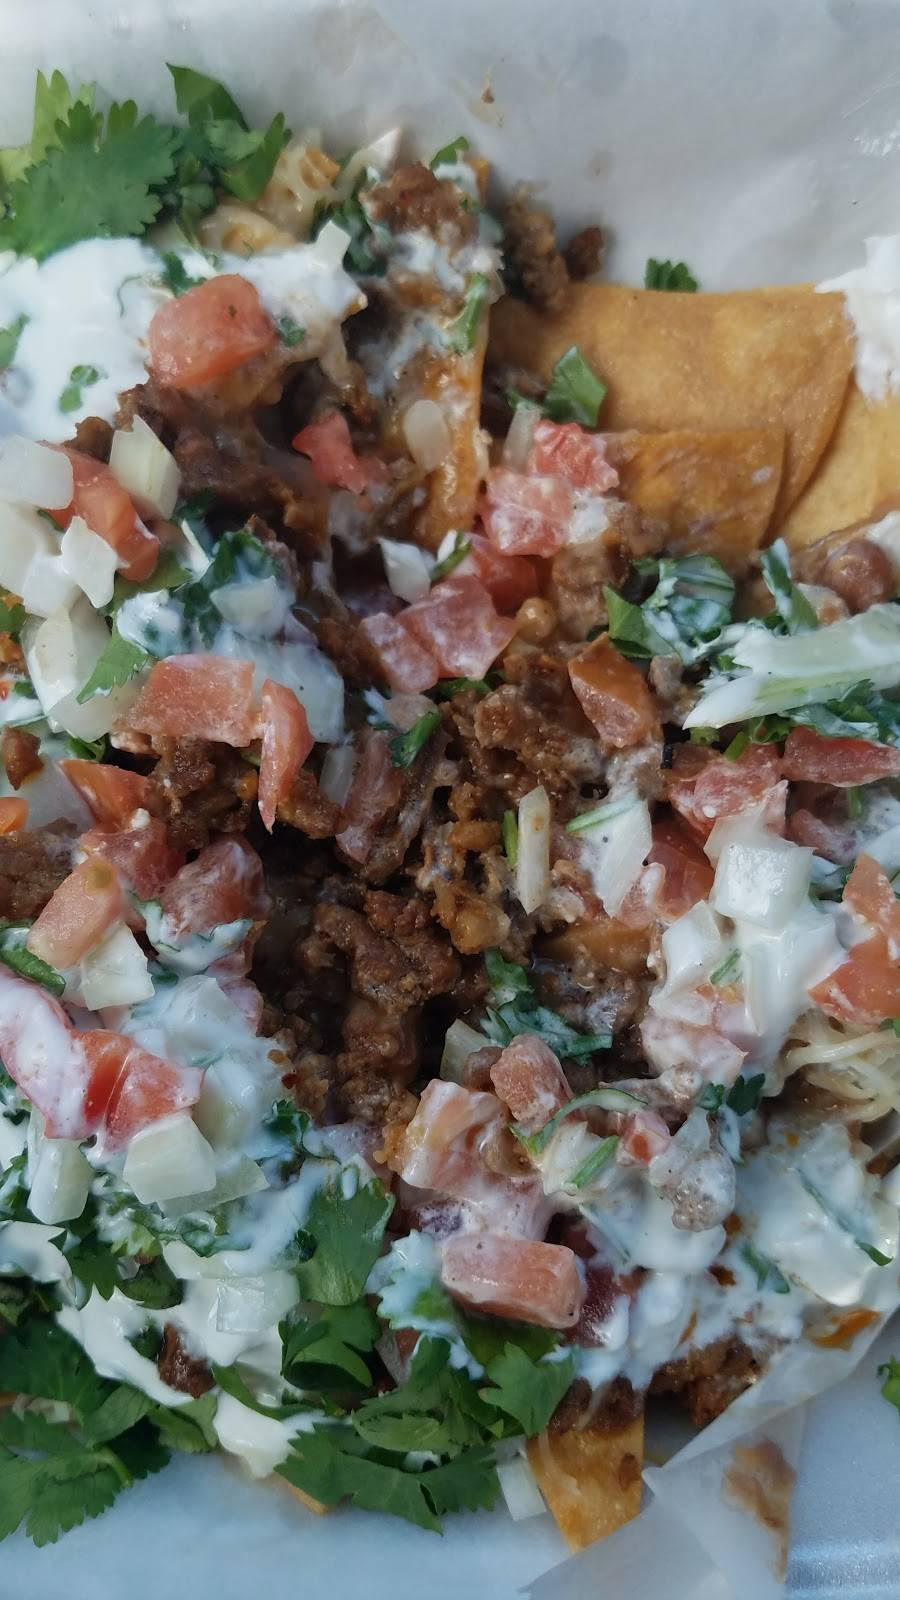 Taqueria Tariacuri | restaurant | Fondren Rd @, Harwin Dr., Houston, TX 77036, USA | 8323735547 OR +1 832-373-5547